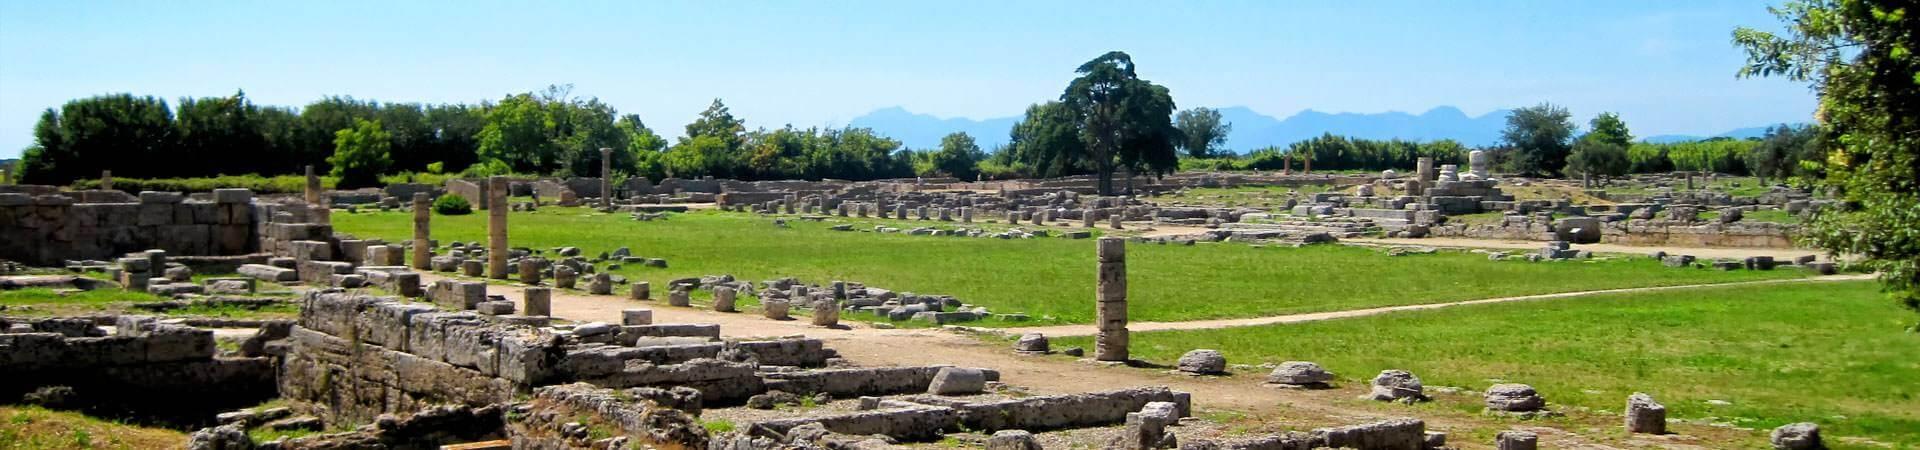 paestum_zona_archeologica